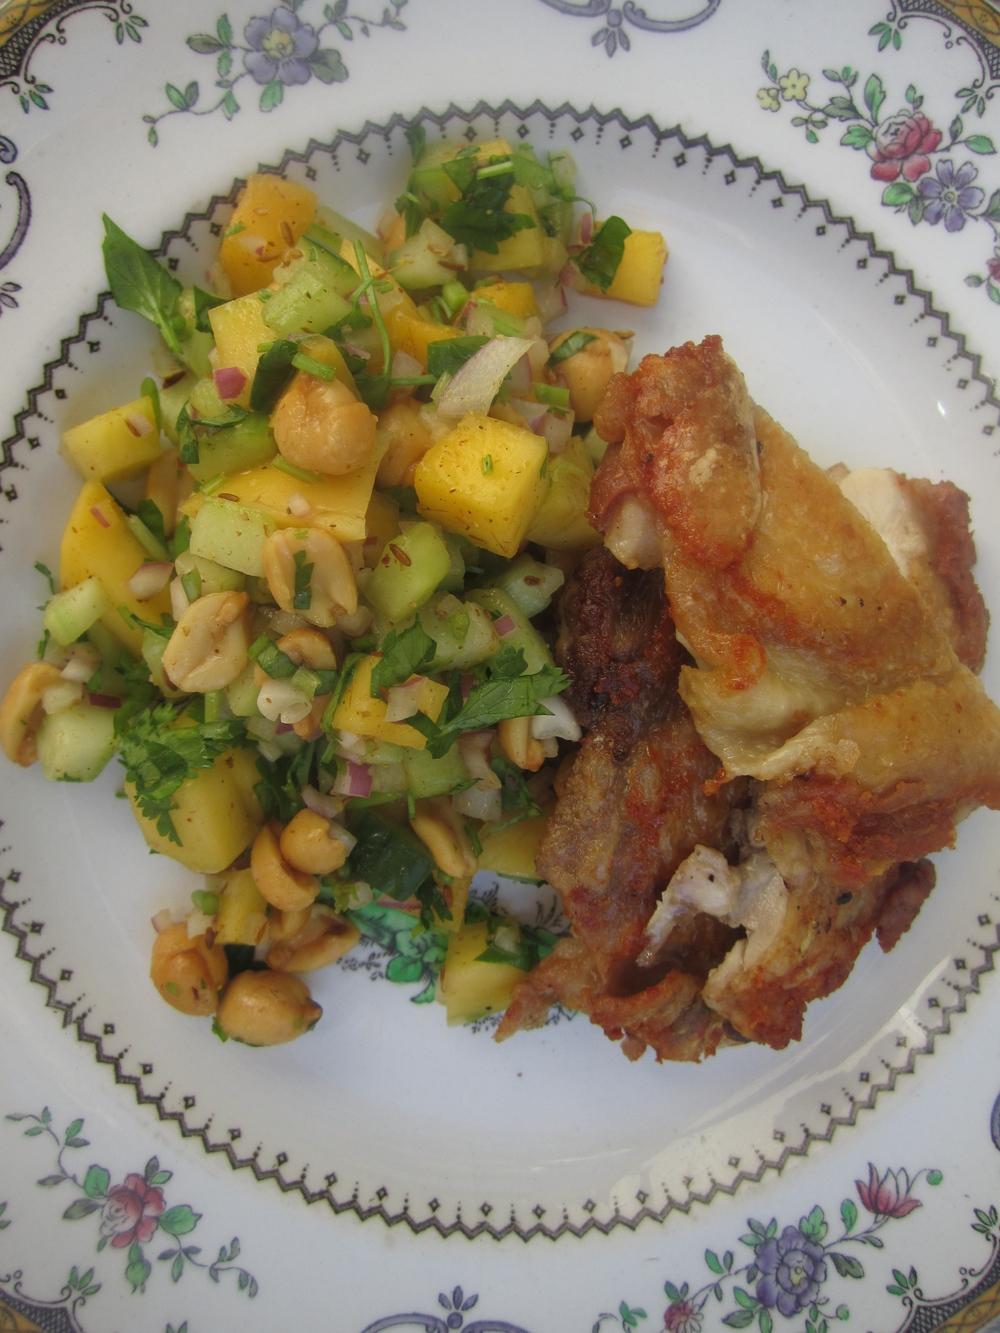 Peanut + Mango Masala Chaat with Brick Chicken